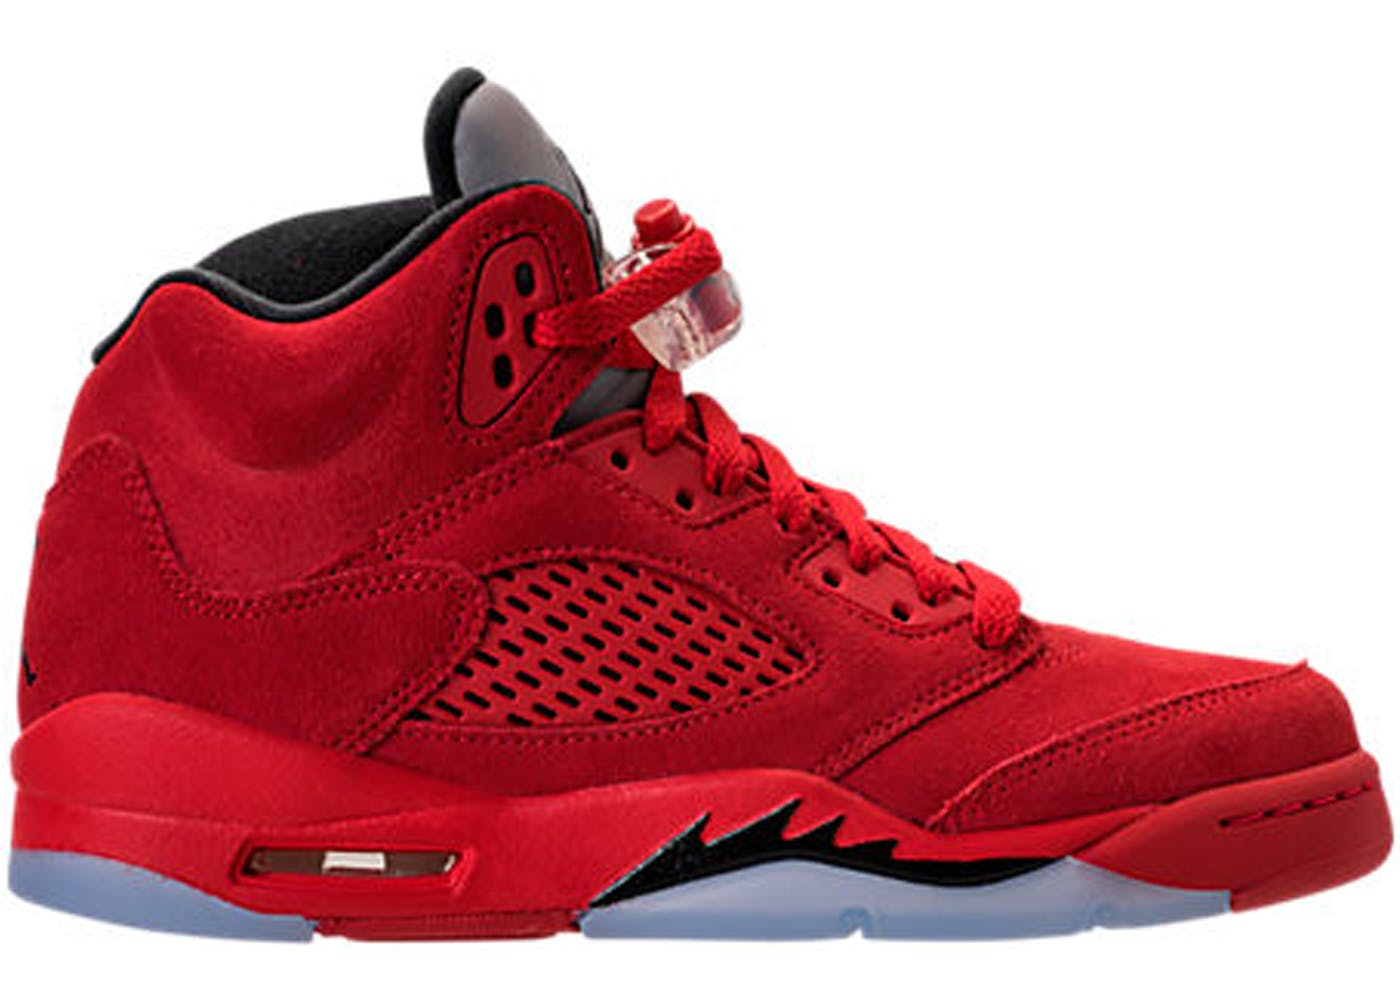 Jordan Shoes For Sale In Japan